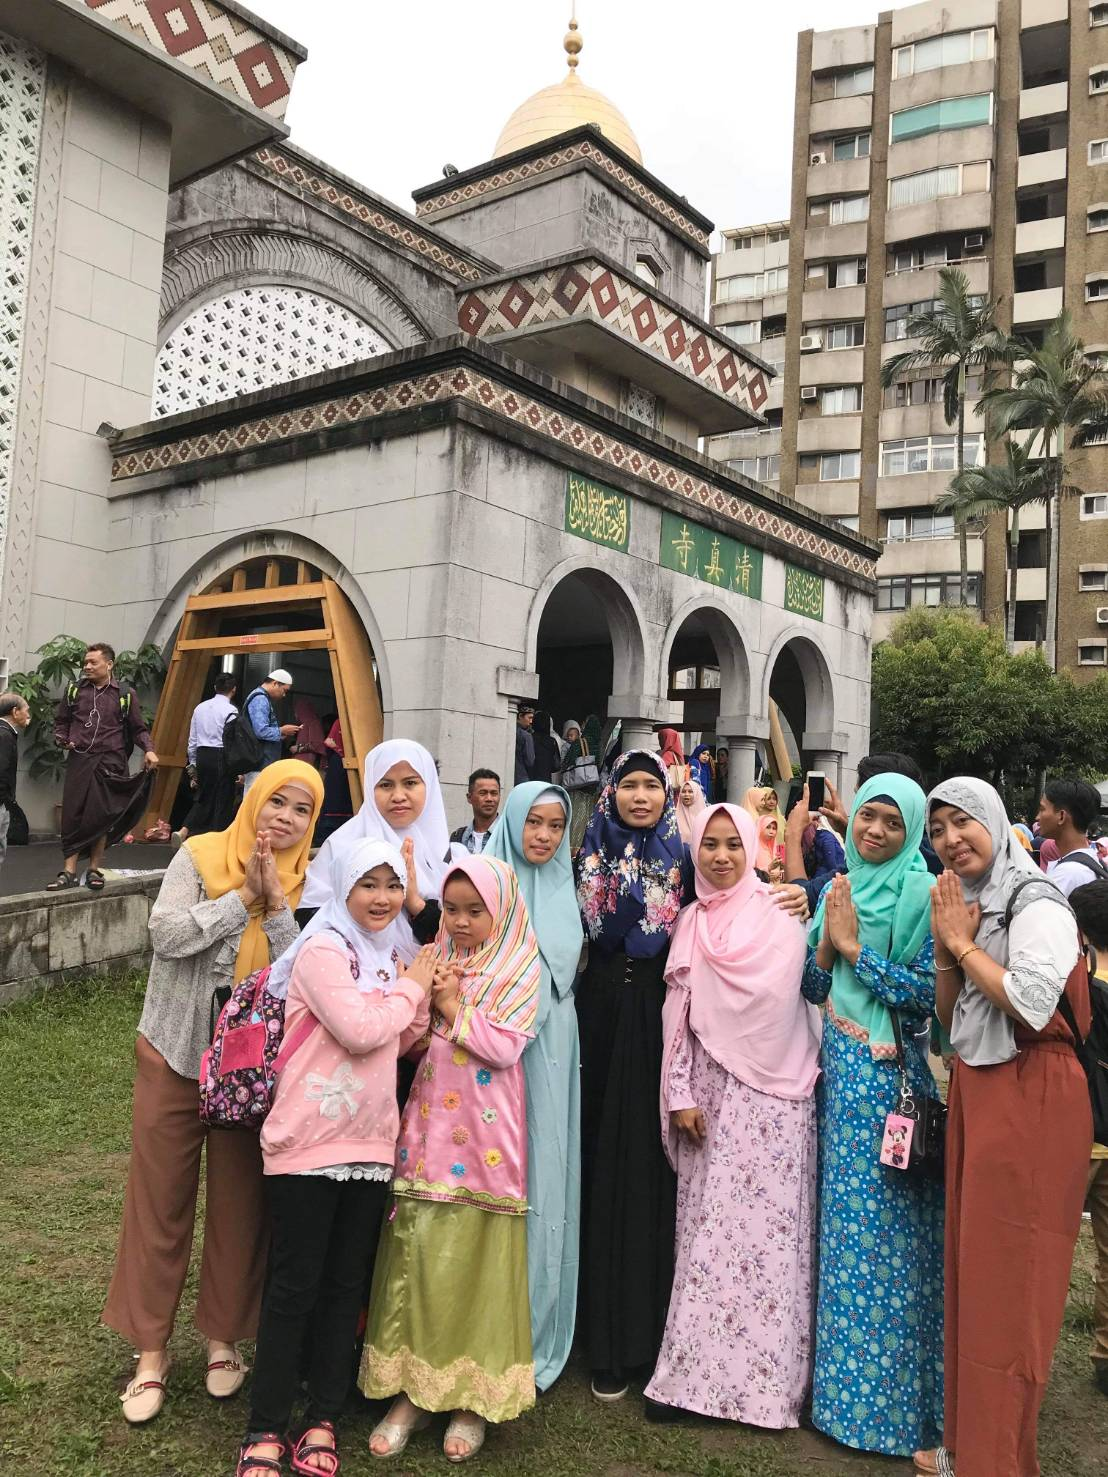 Ngày lễ Eid al-Fitr của Inđônêxia Tác giả: Anny Ting